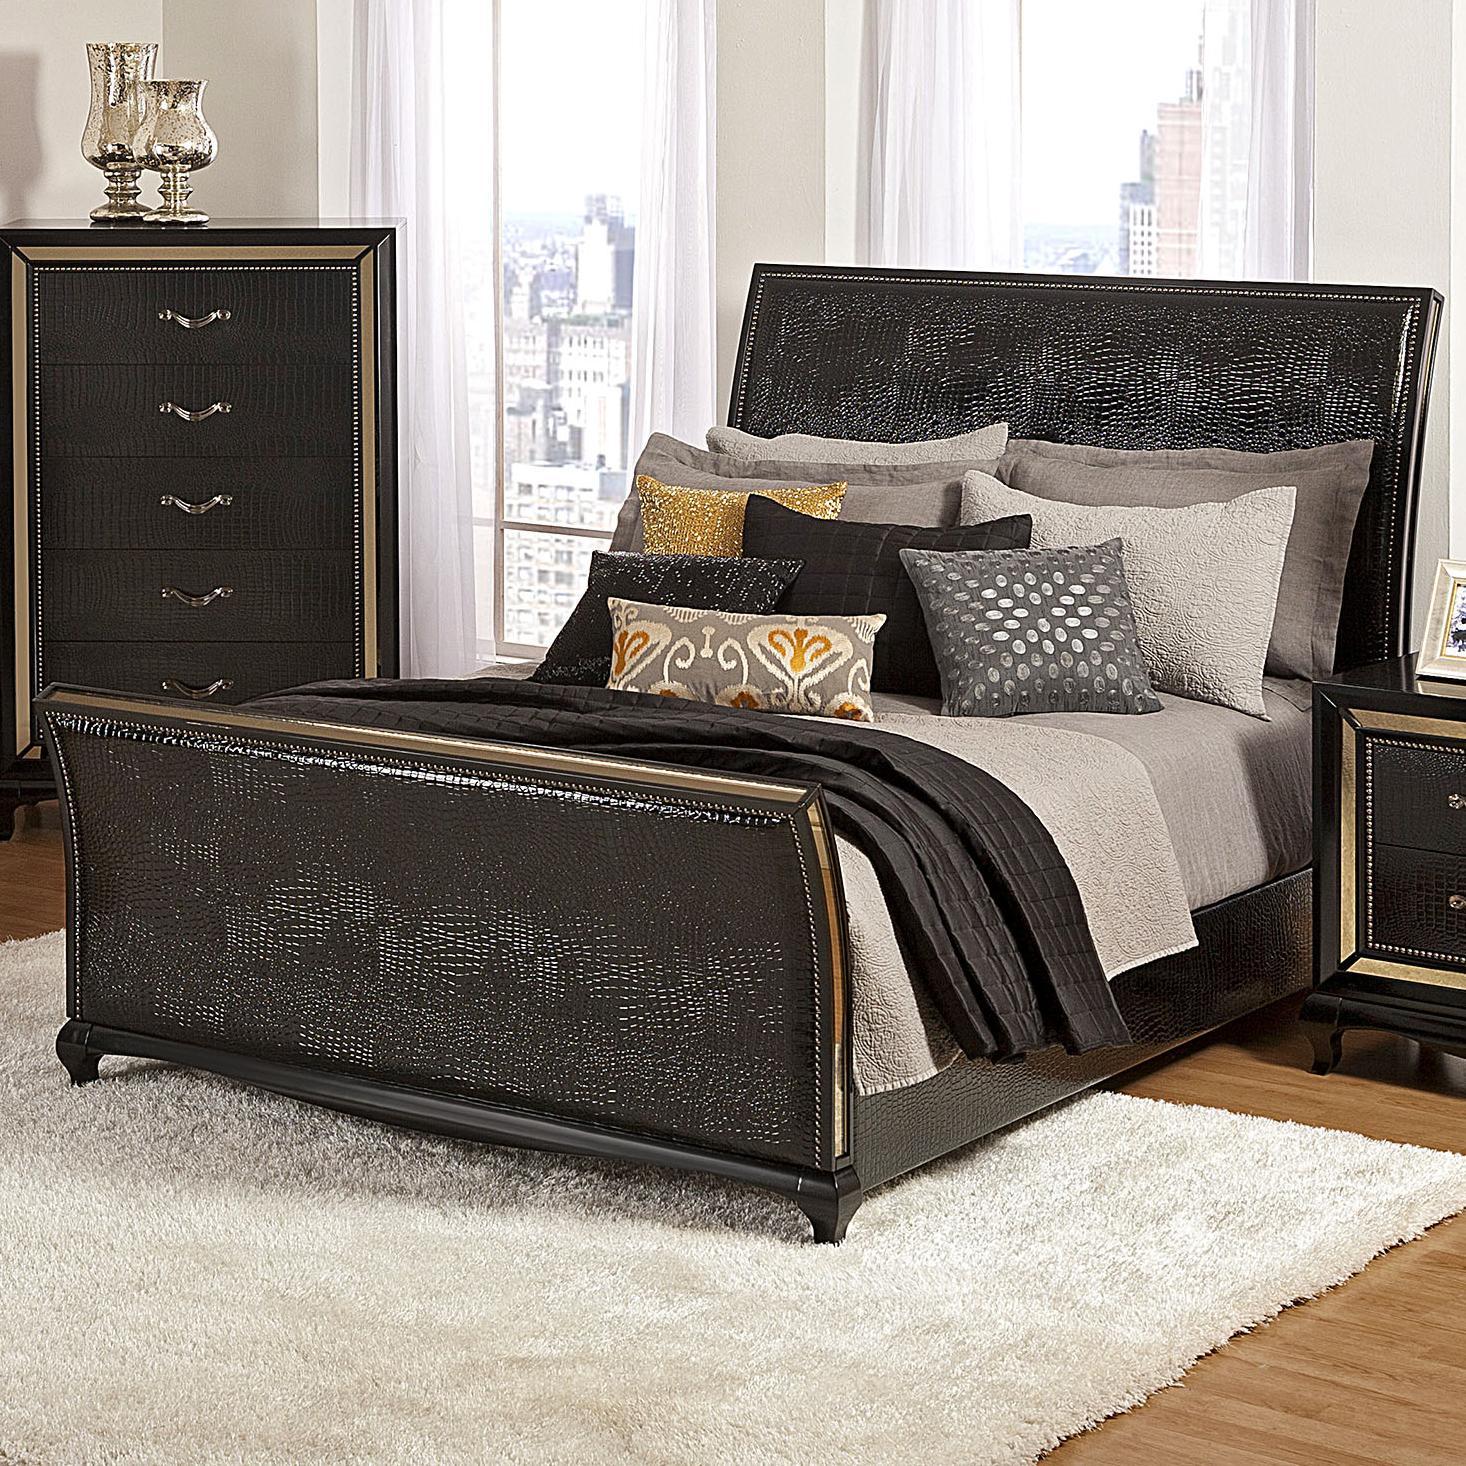 Najarian Ibiza California King Upholstered Sleigh Bed - Item Number: BDIBIUHBKE+BDIBIUFBKE+BDIBIRSKWP